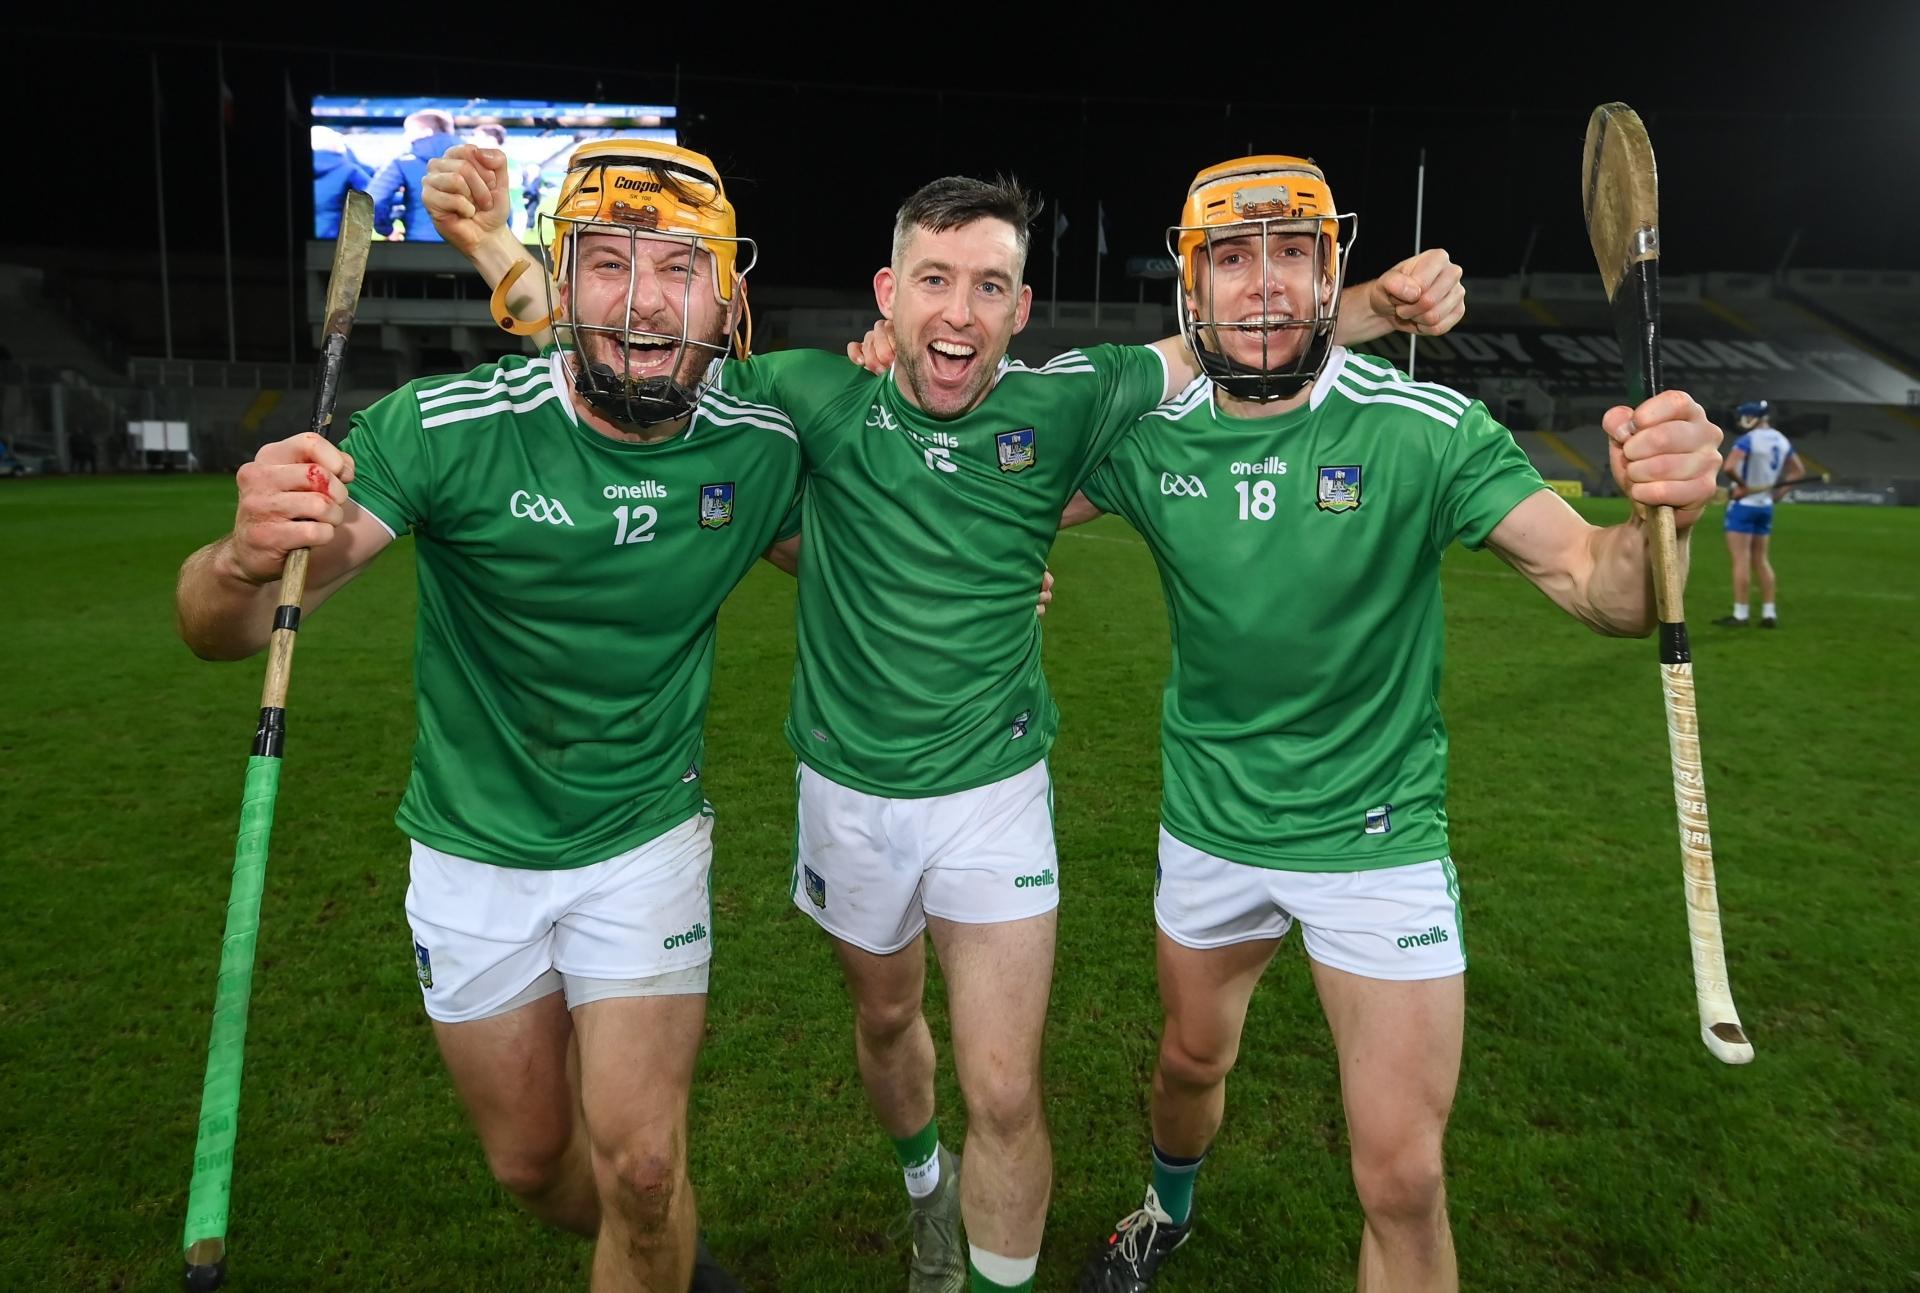 All ireland hurling 2021 betting sites duckworth lewis betting rules holdem